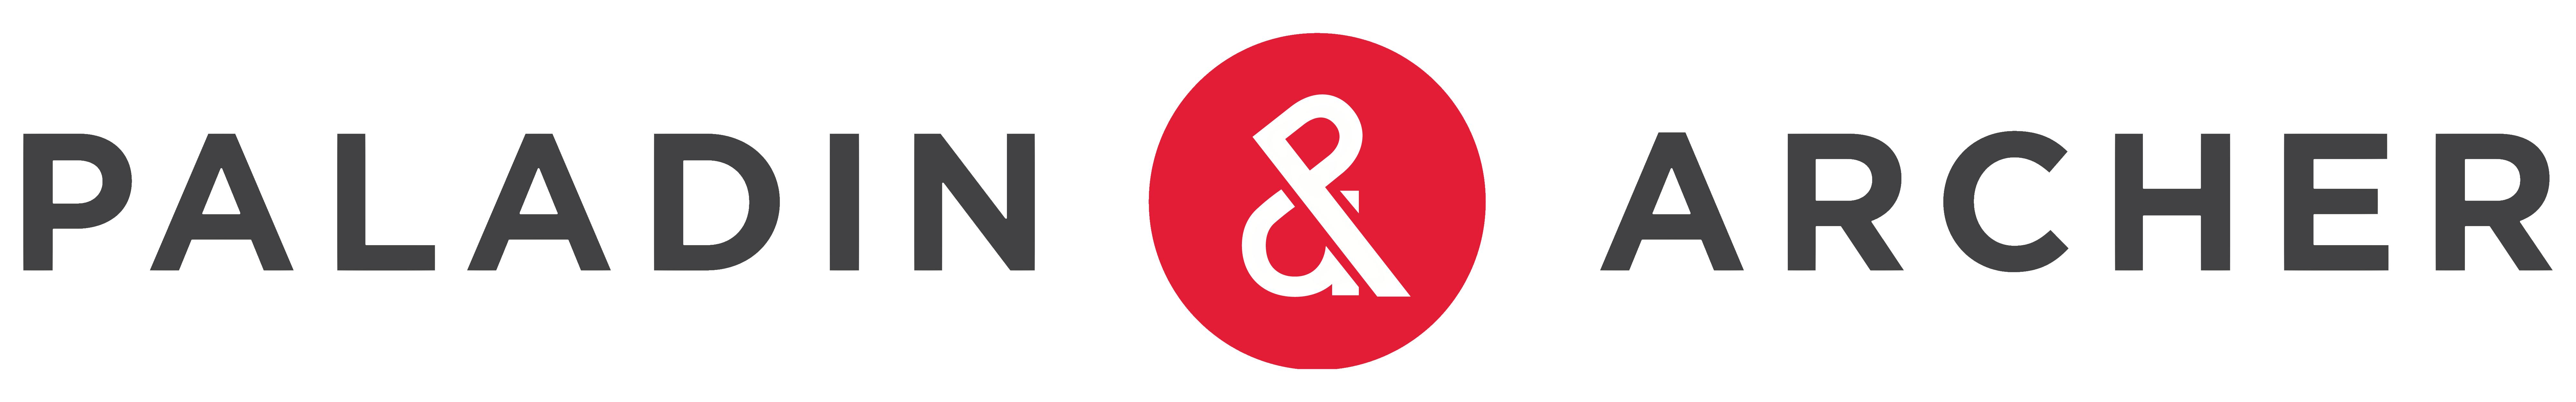 PALADIN & ARCHER